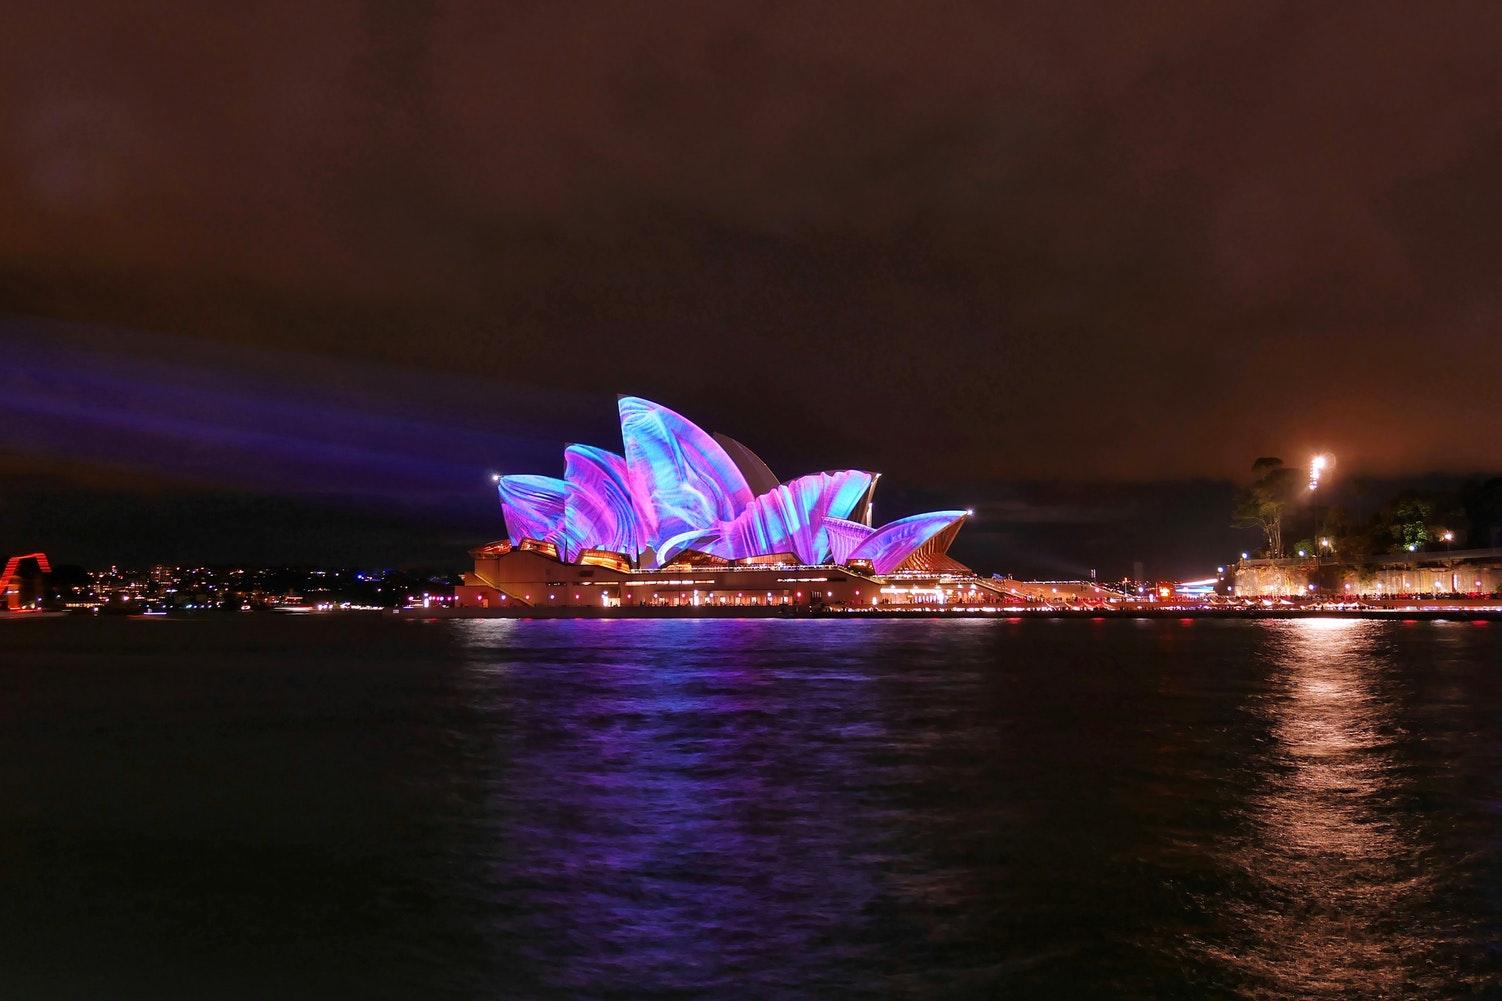 sydney - places to go for new year's eve - nye - sydney harbour - sydney opera house - nye celebrations - light show